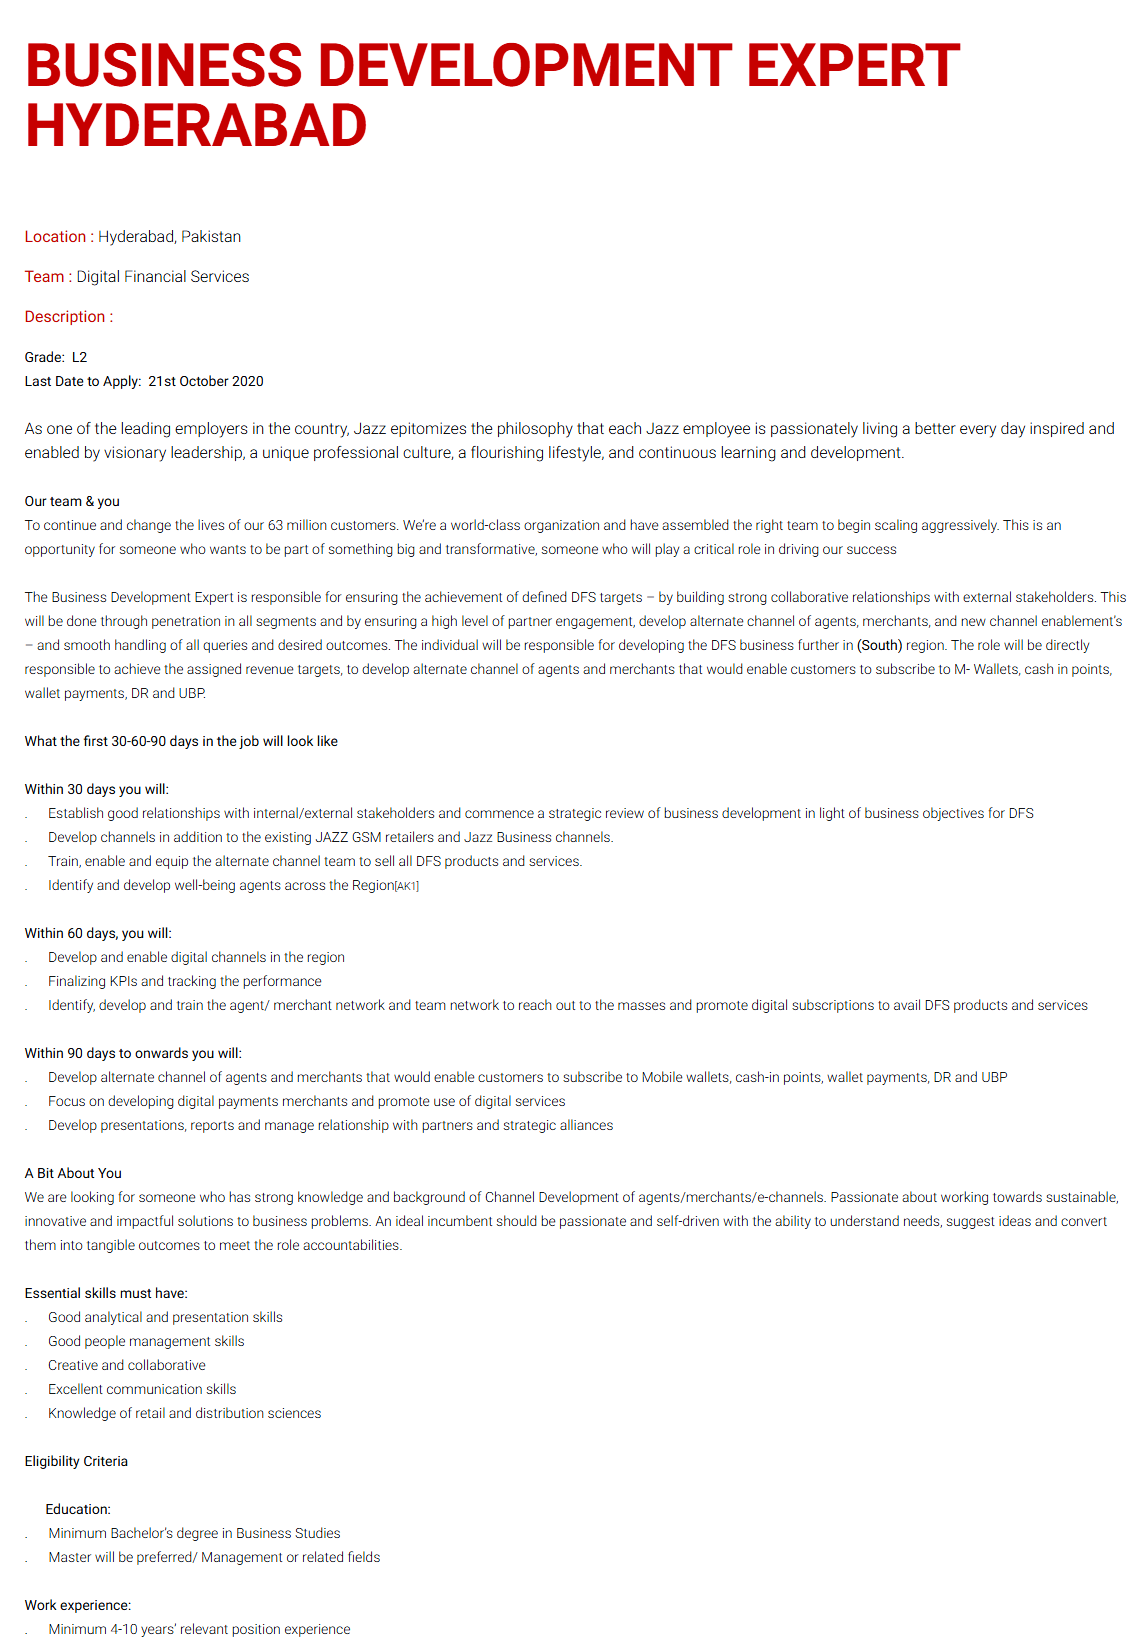 Business Development Expert Jobs 2020 in Hyderabad